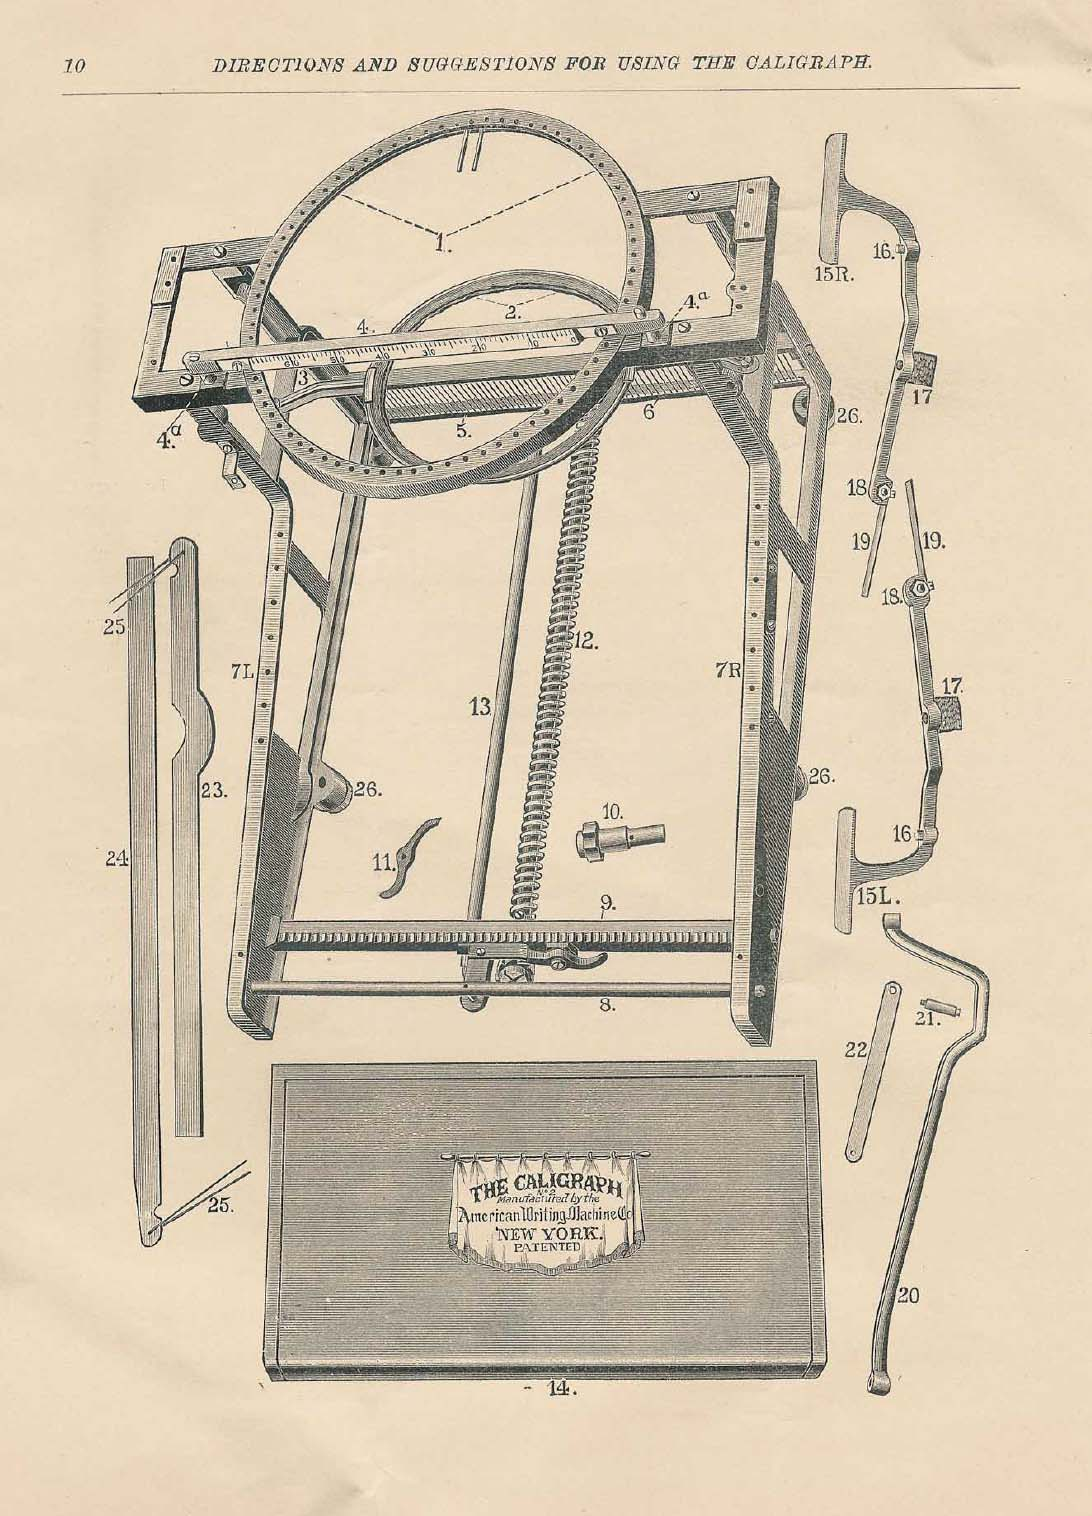 Manual Typewriter Diagram 1999 Toyota 4runner Brake Controller Wiring The Revolution Blog Caligraph Progress And